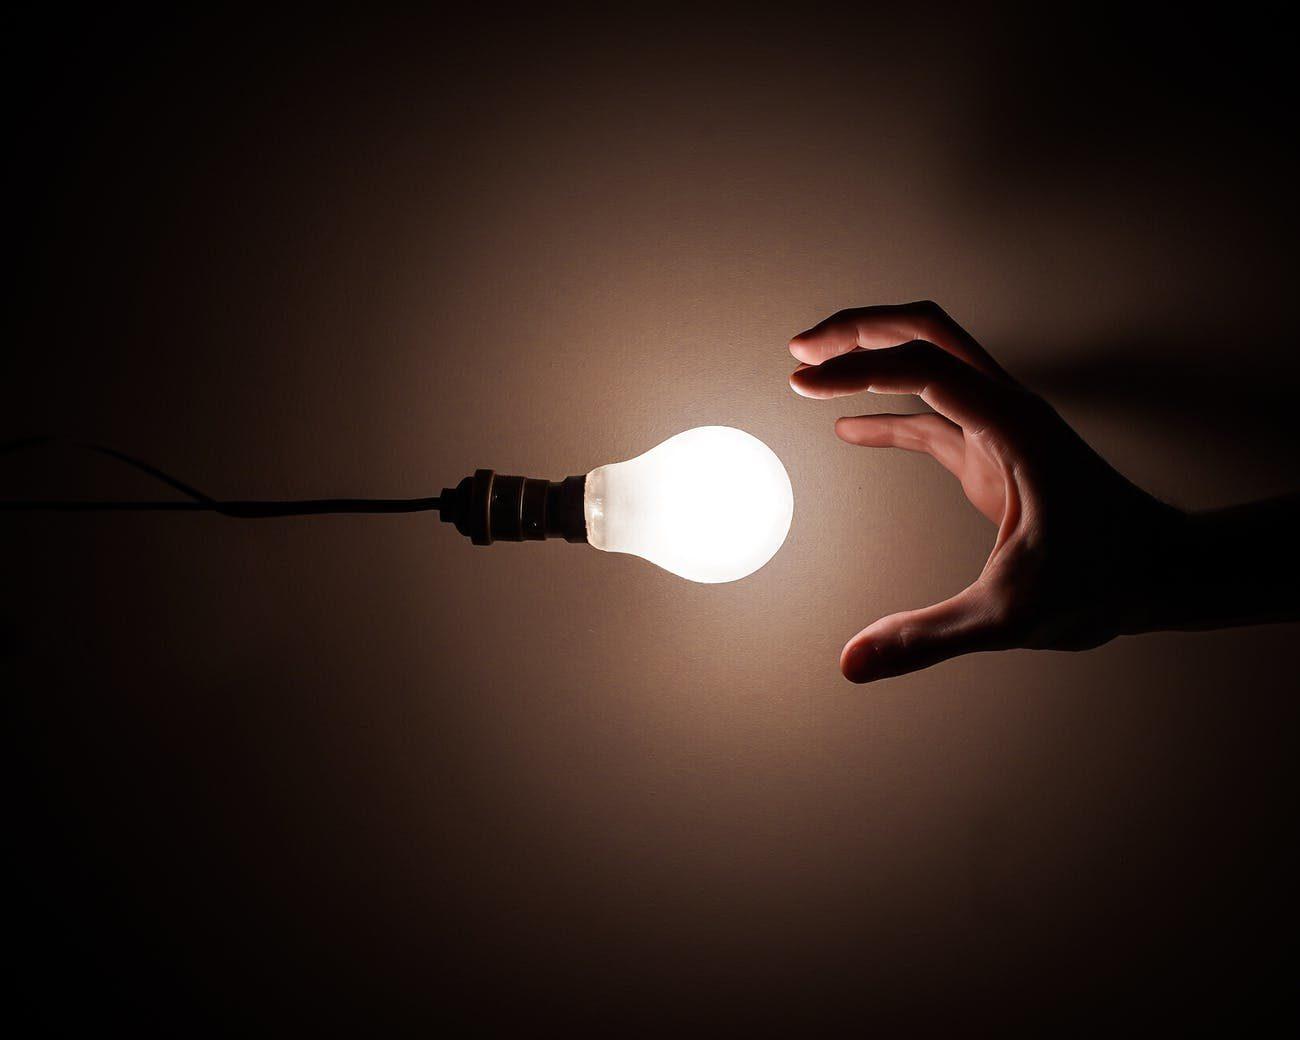 person holding white light bulb